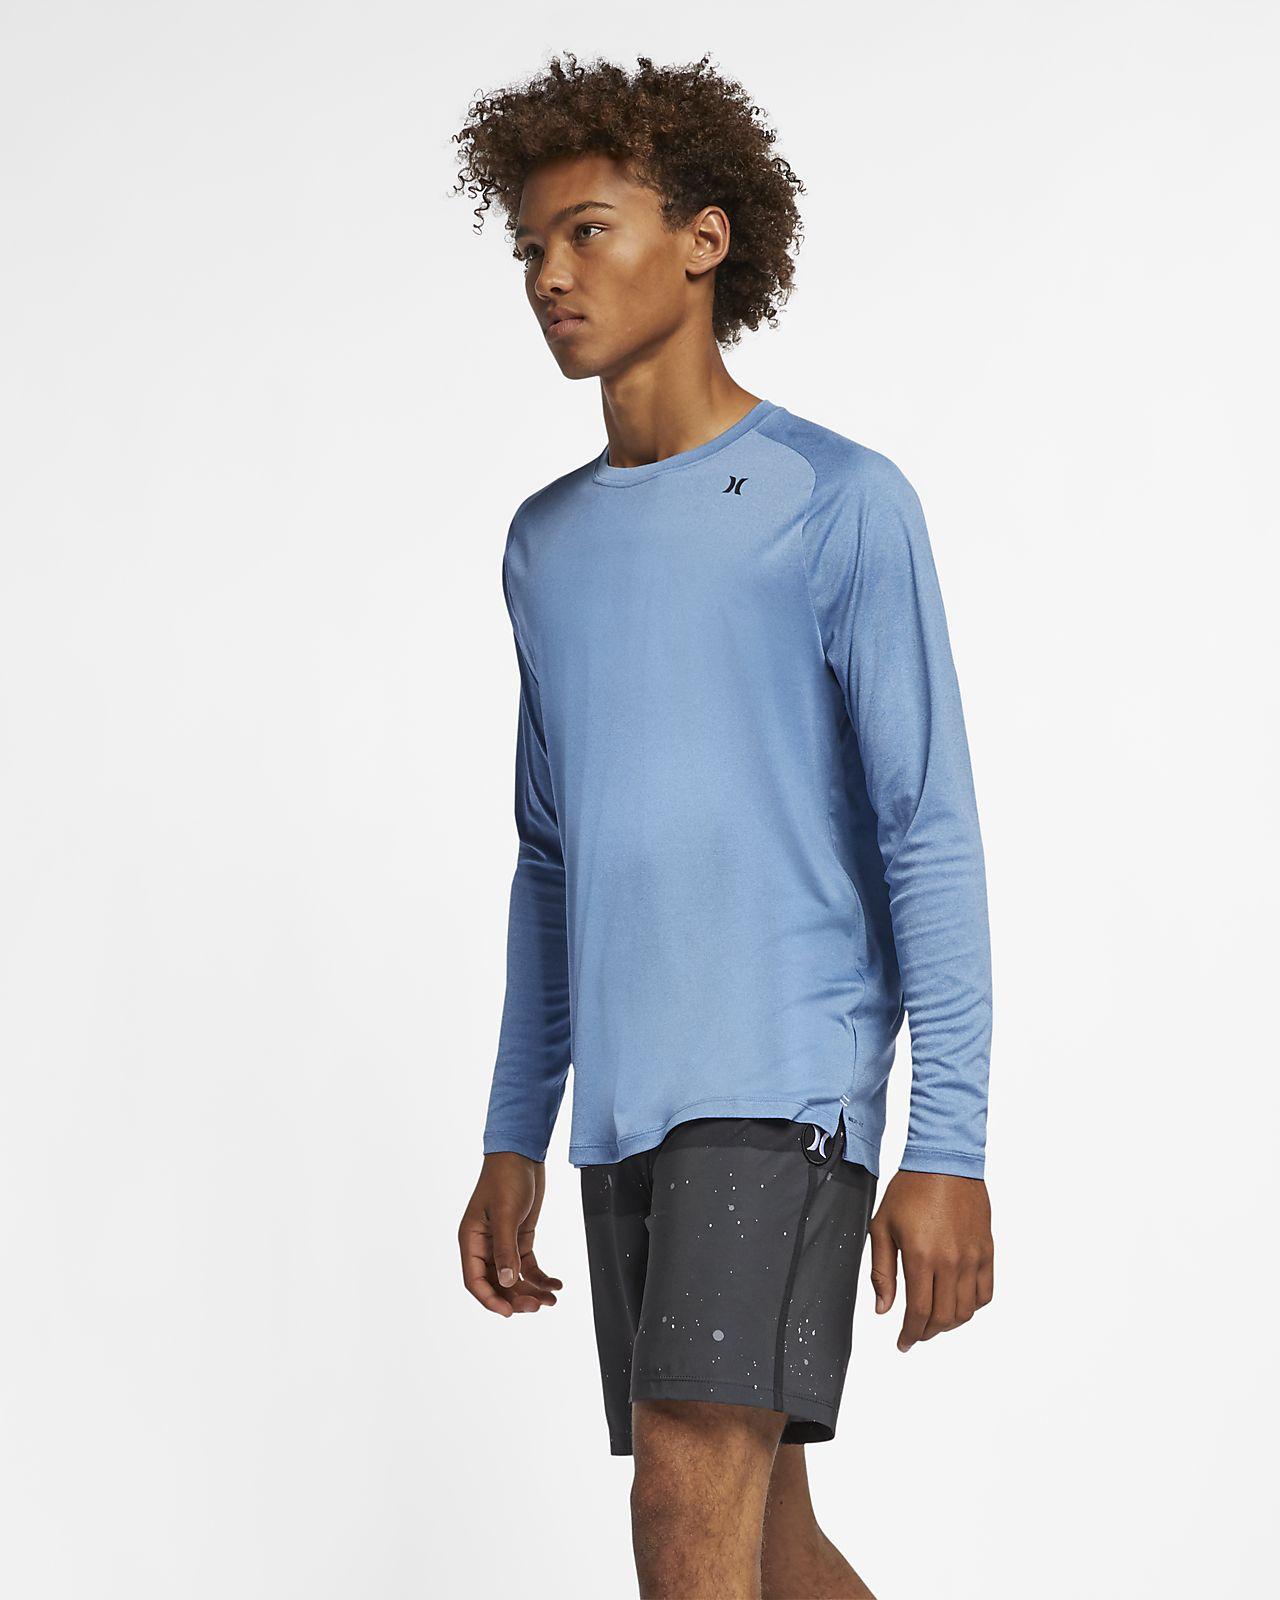 Tee-shirt à manches longues Hurley Quick Dry pour Homme